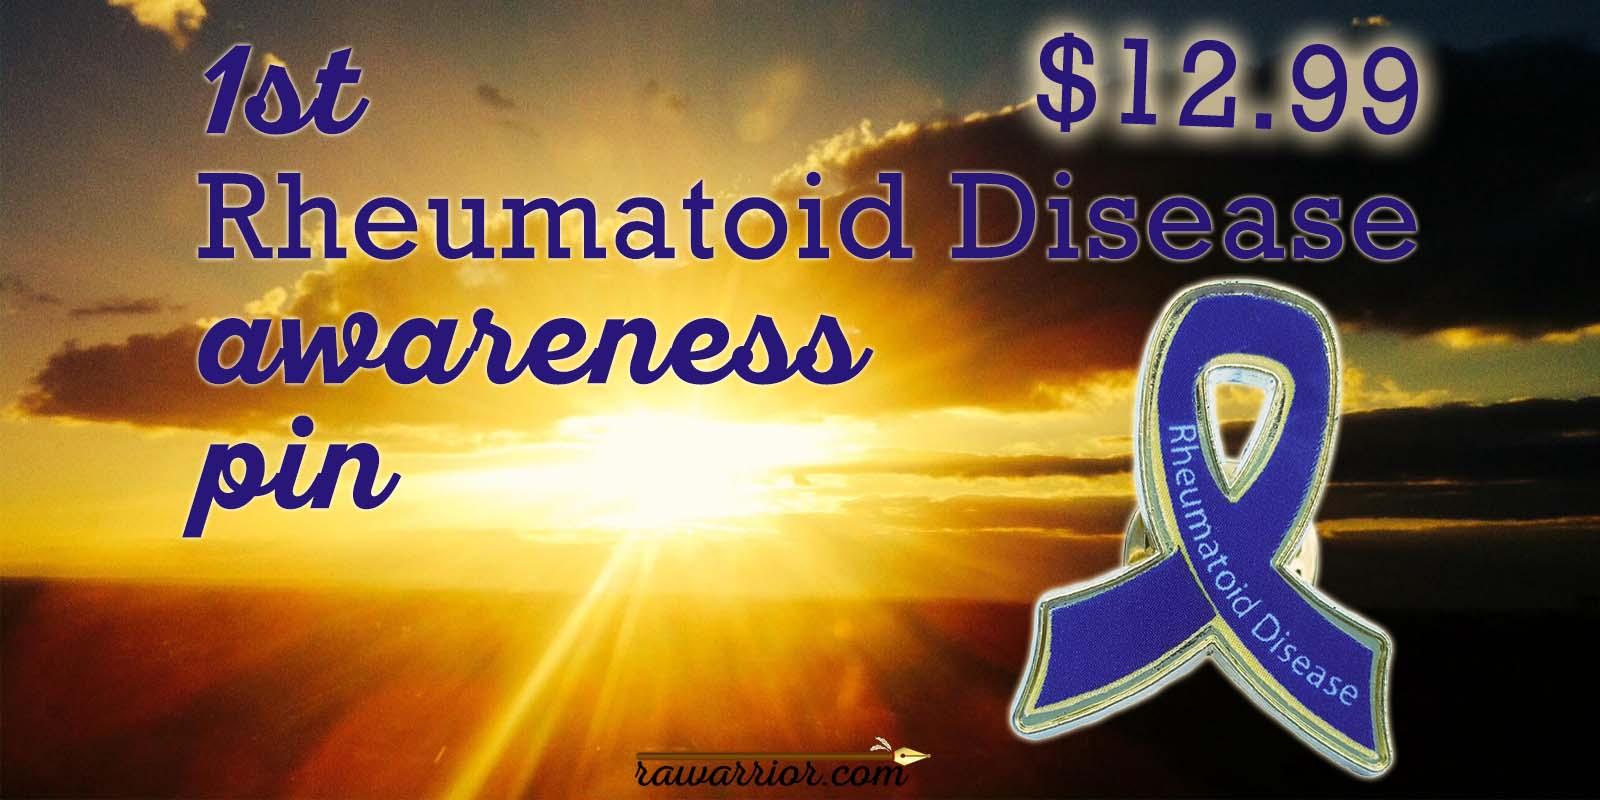 Rheumatoid Arthritis Awareness Pin